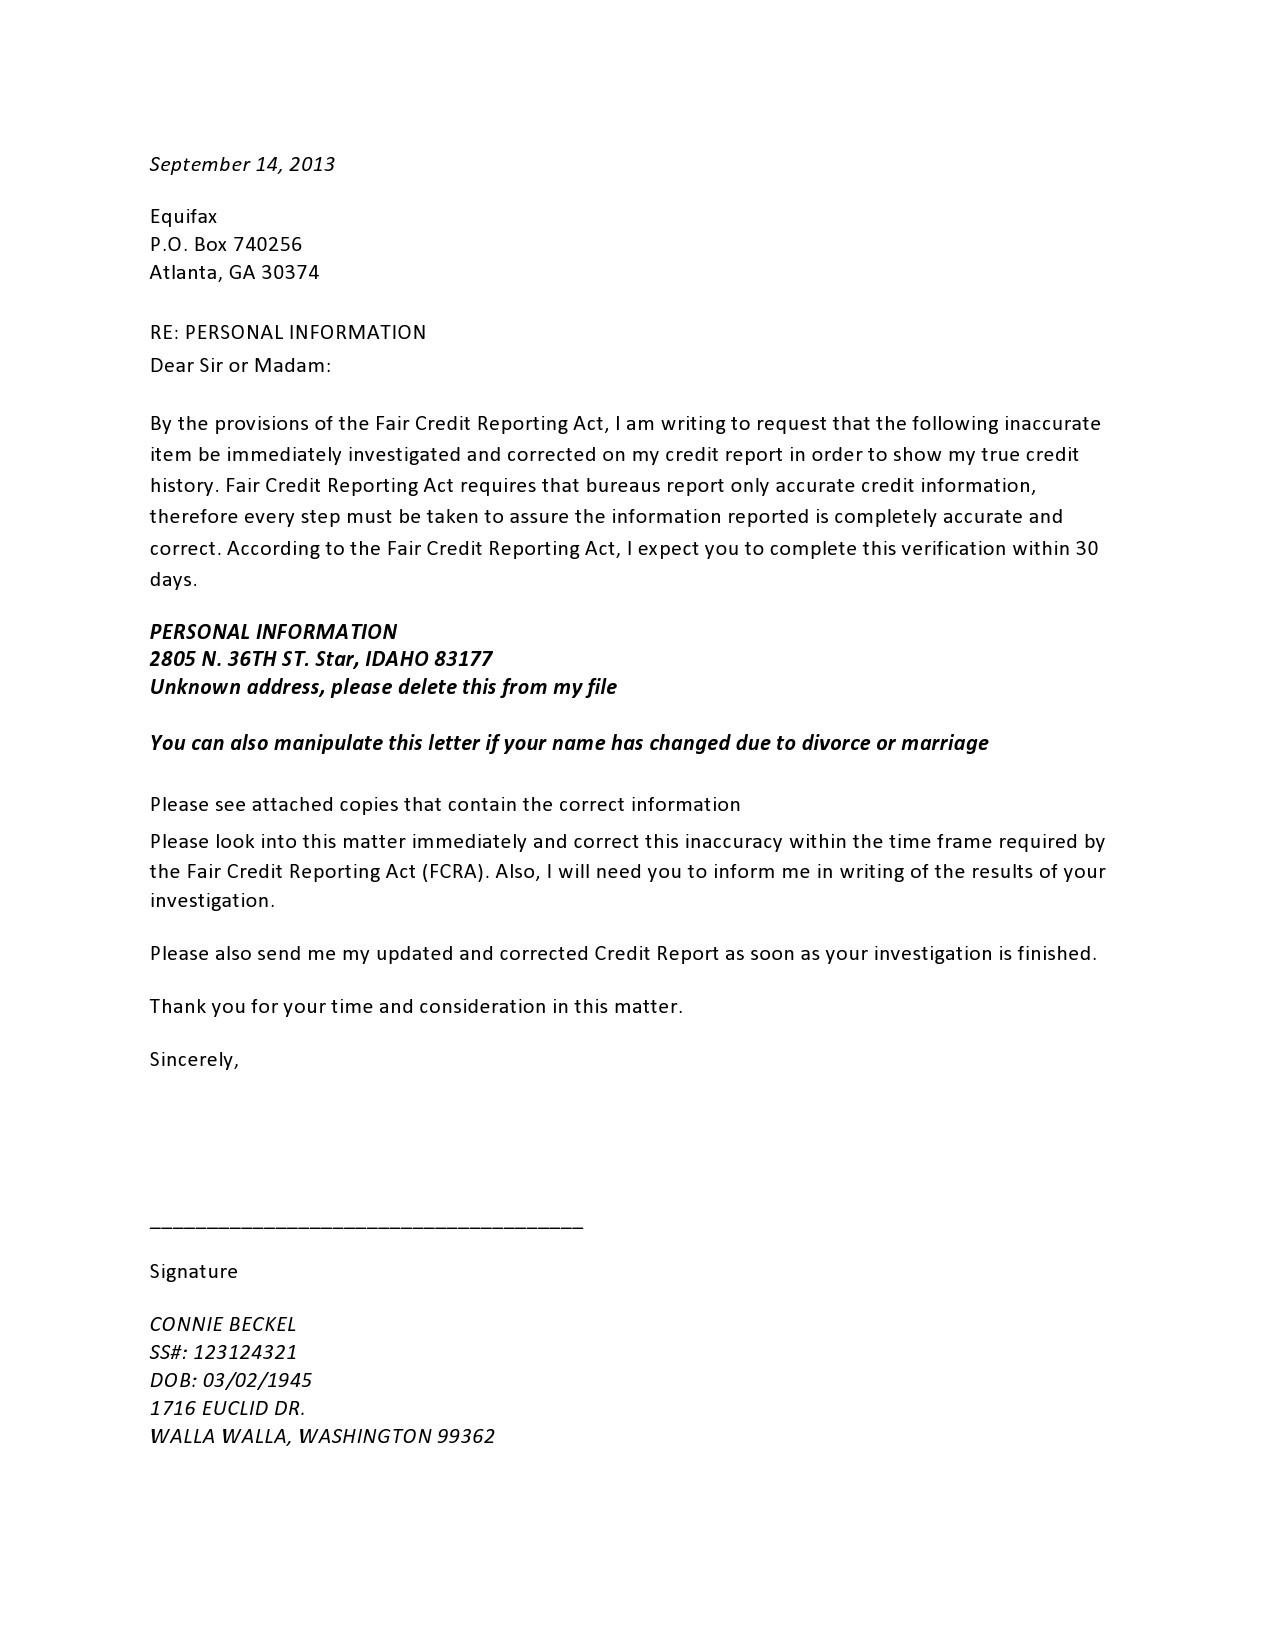 Free credit dispute letter 34